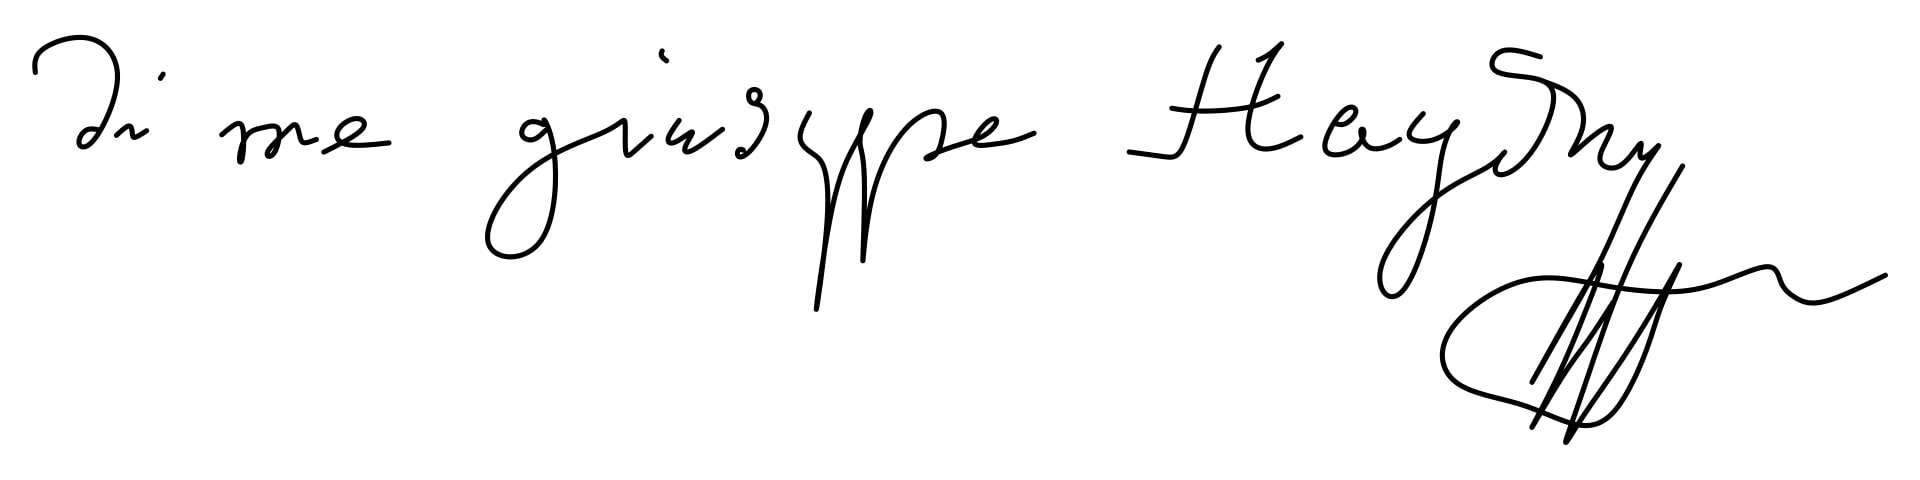 Joseph Haydn Signature